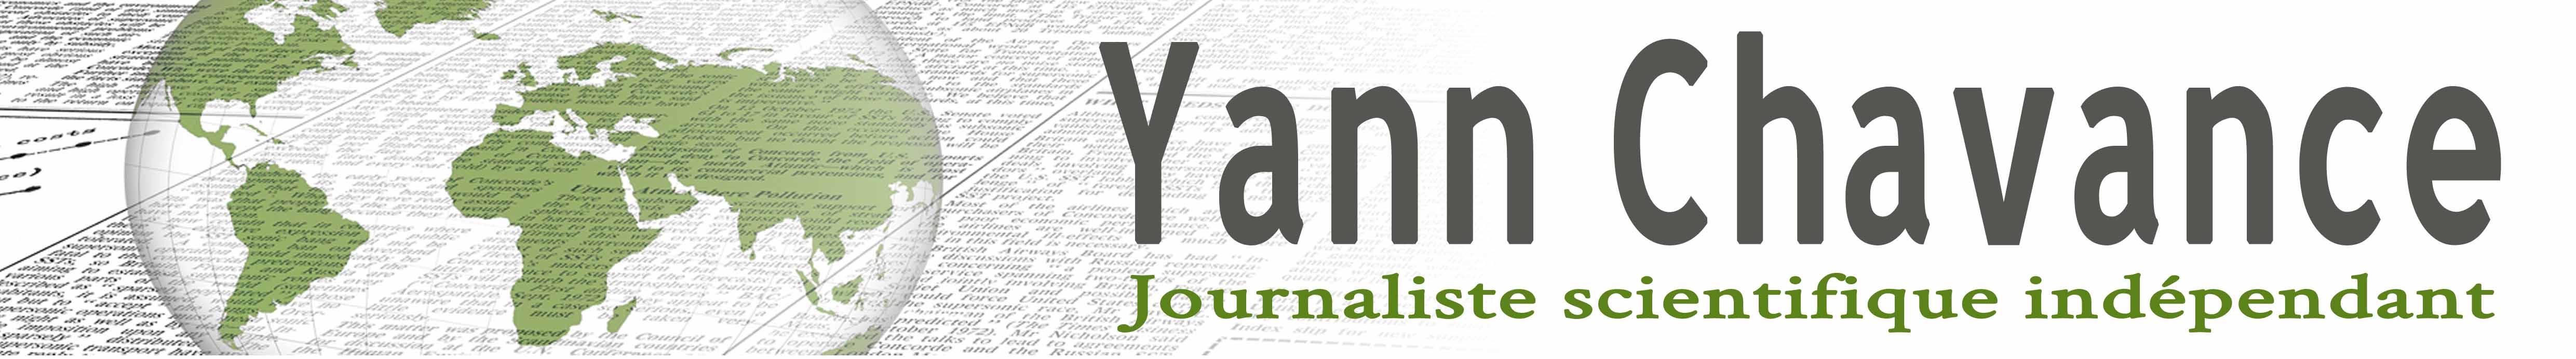 Yann Chavance